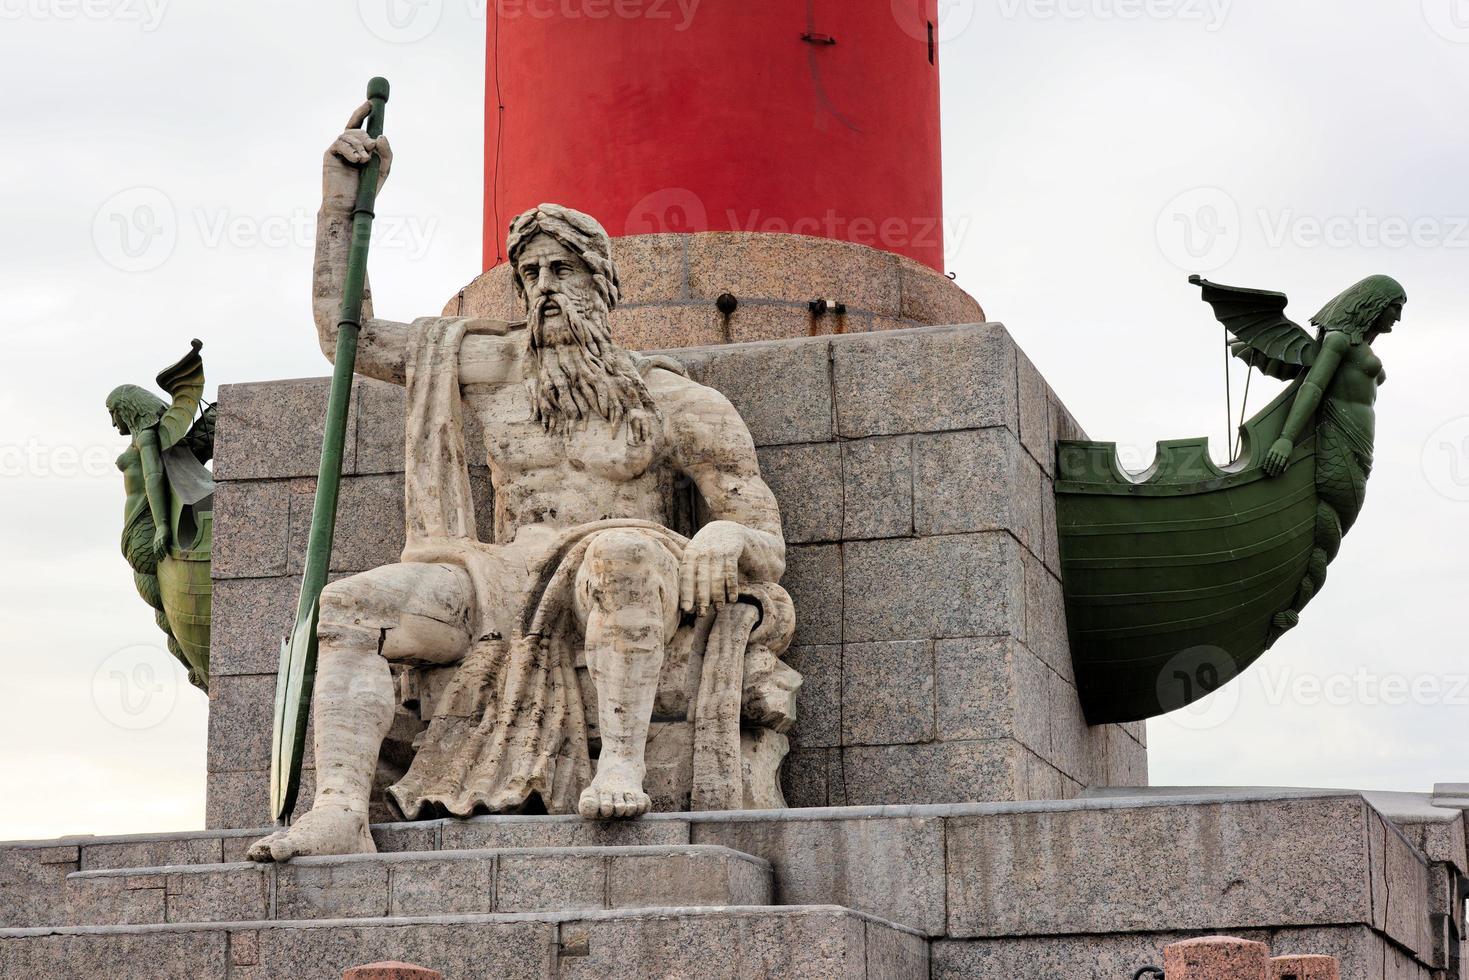 colonna rostrale sull'isola vasilyevskiy, st. Pietroburgo, Russia foto